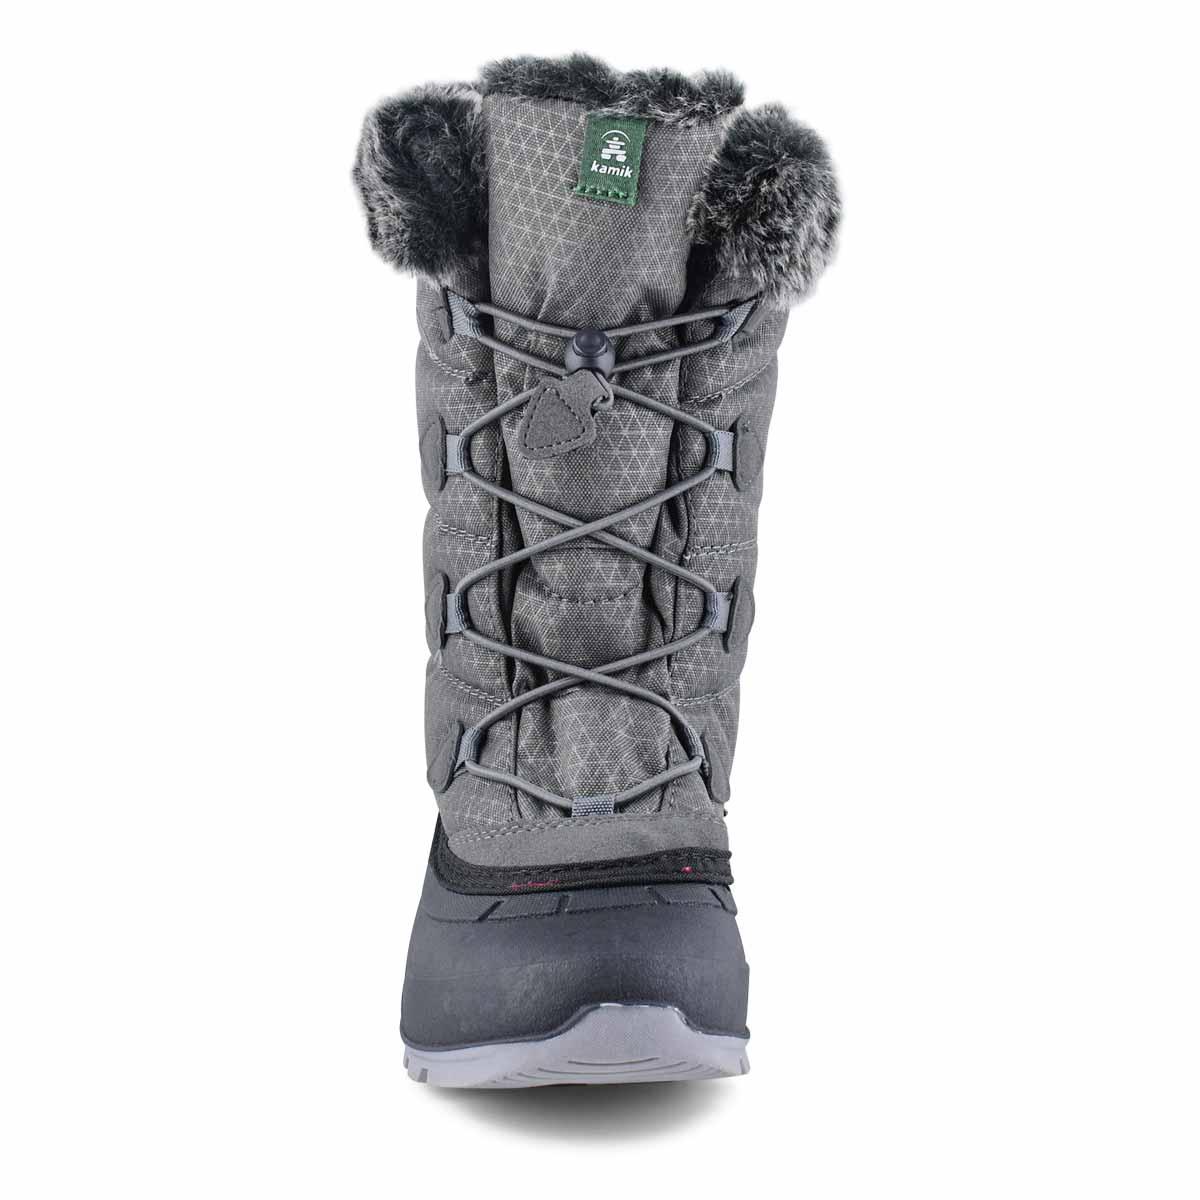 Women's MOMENTUM 2 charcoal winter boots